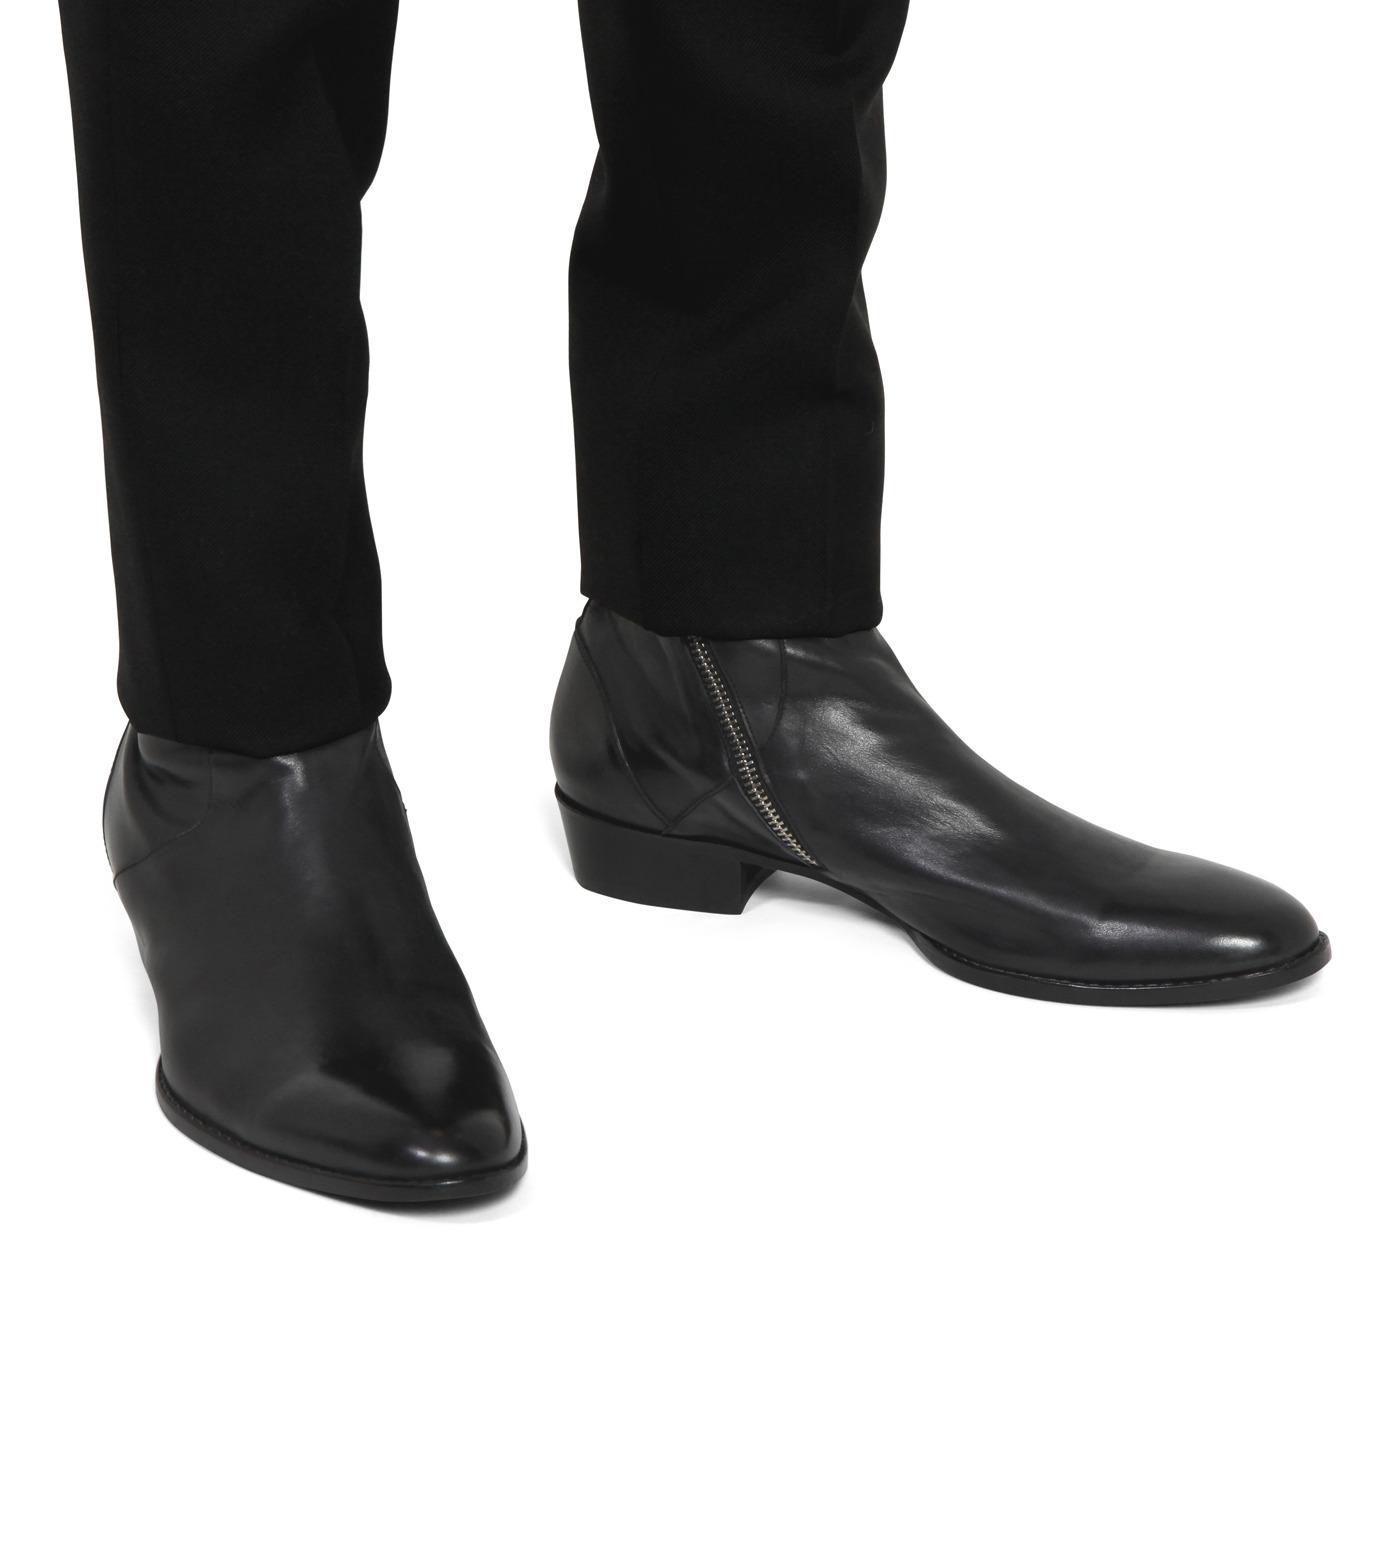 HL HEDDIE LOVU(エイチエル・エディールーヴ)のSIDE ZIP BOOTS-BLACK(シューズ/shoes)-18S90002-13 拡大詳細画像5